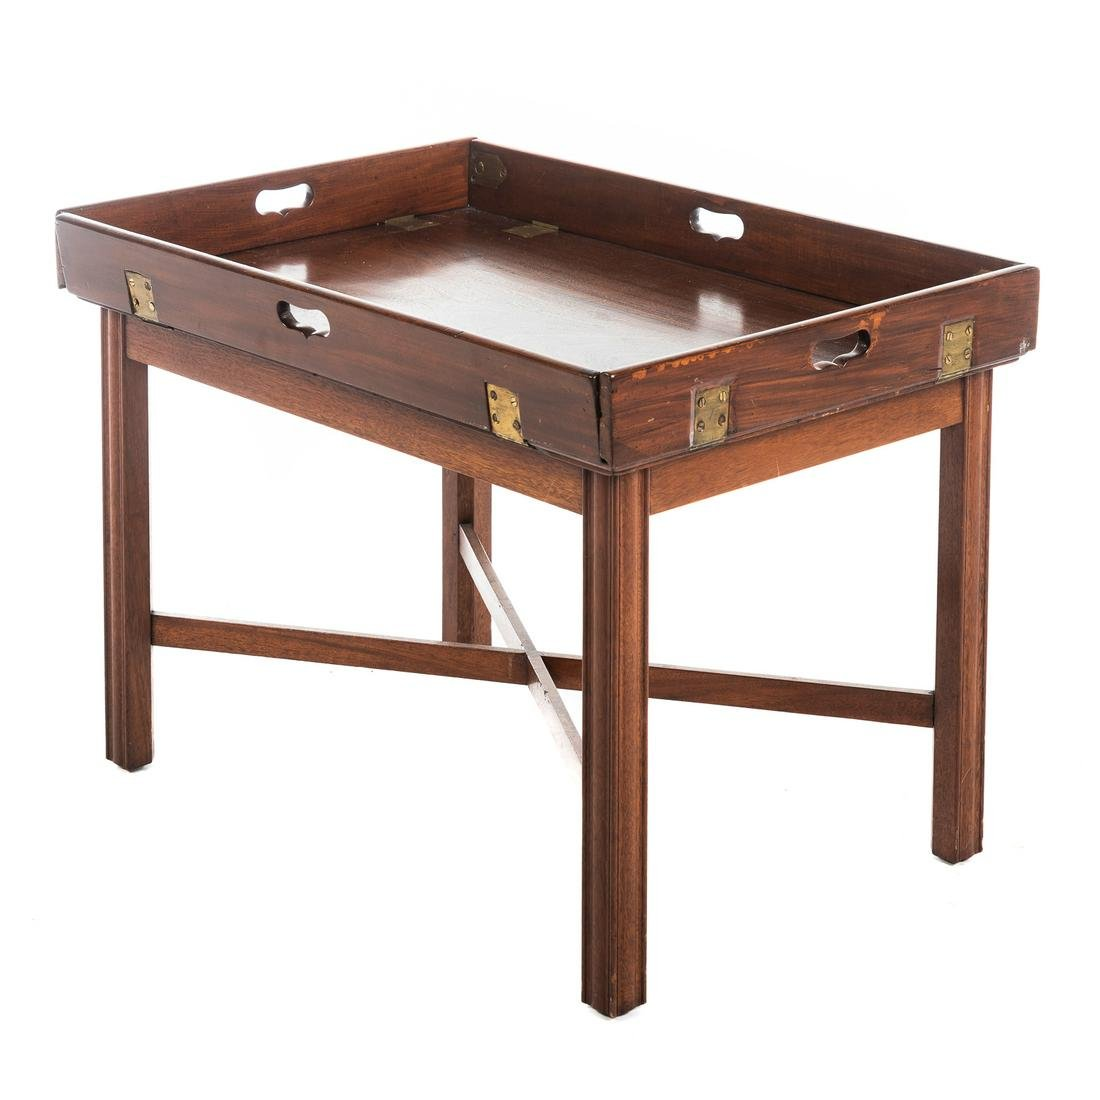 George III Style Mahogany Butler's Tray Table